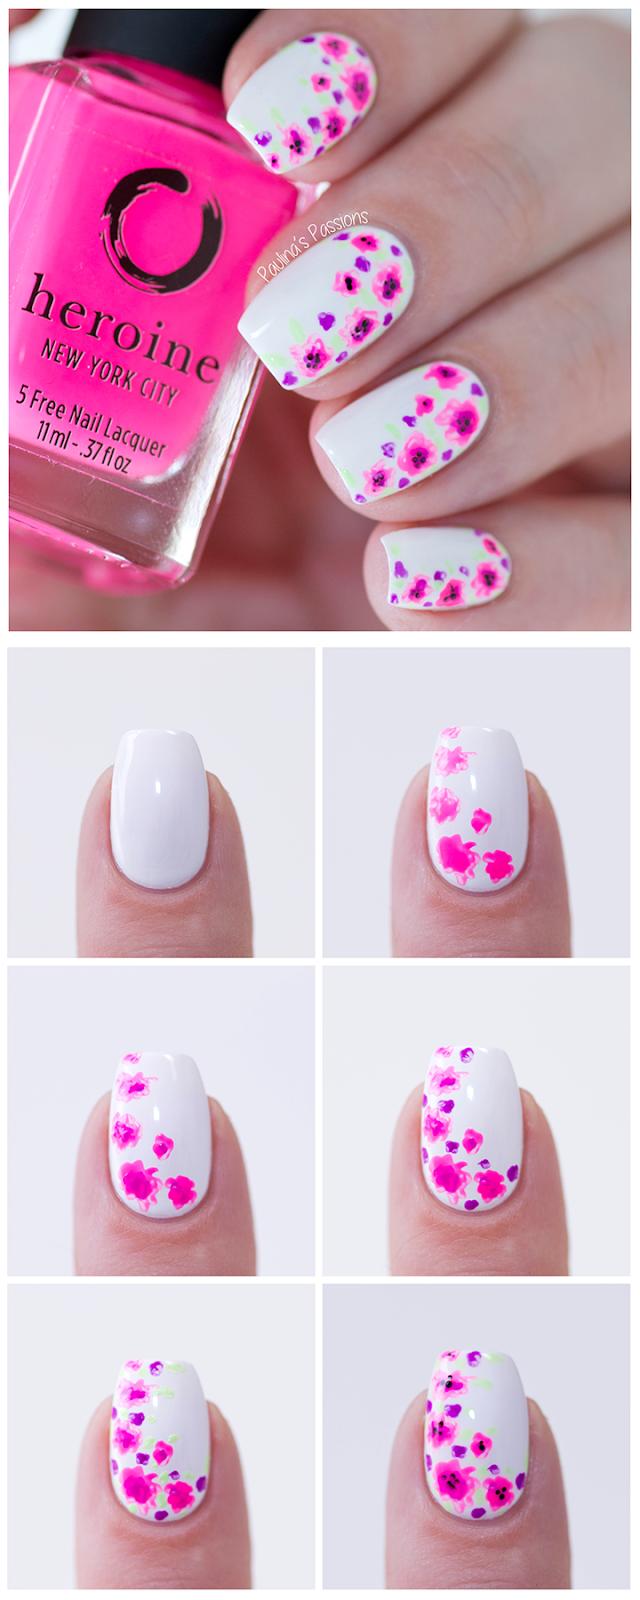 Tutorial Easy At 101 Nail Tutorials Blog Floral Nails Pictorial